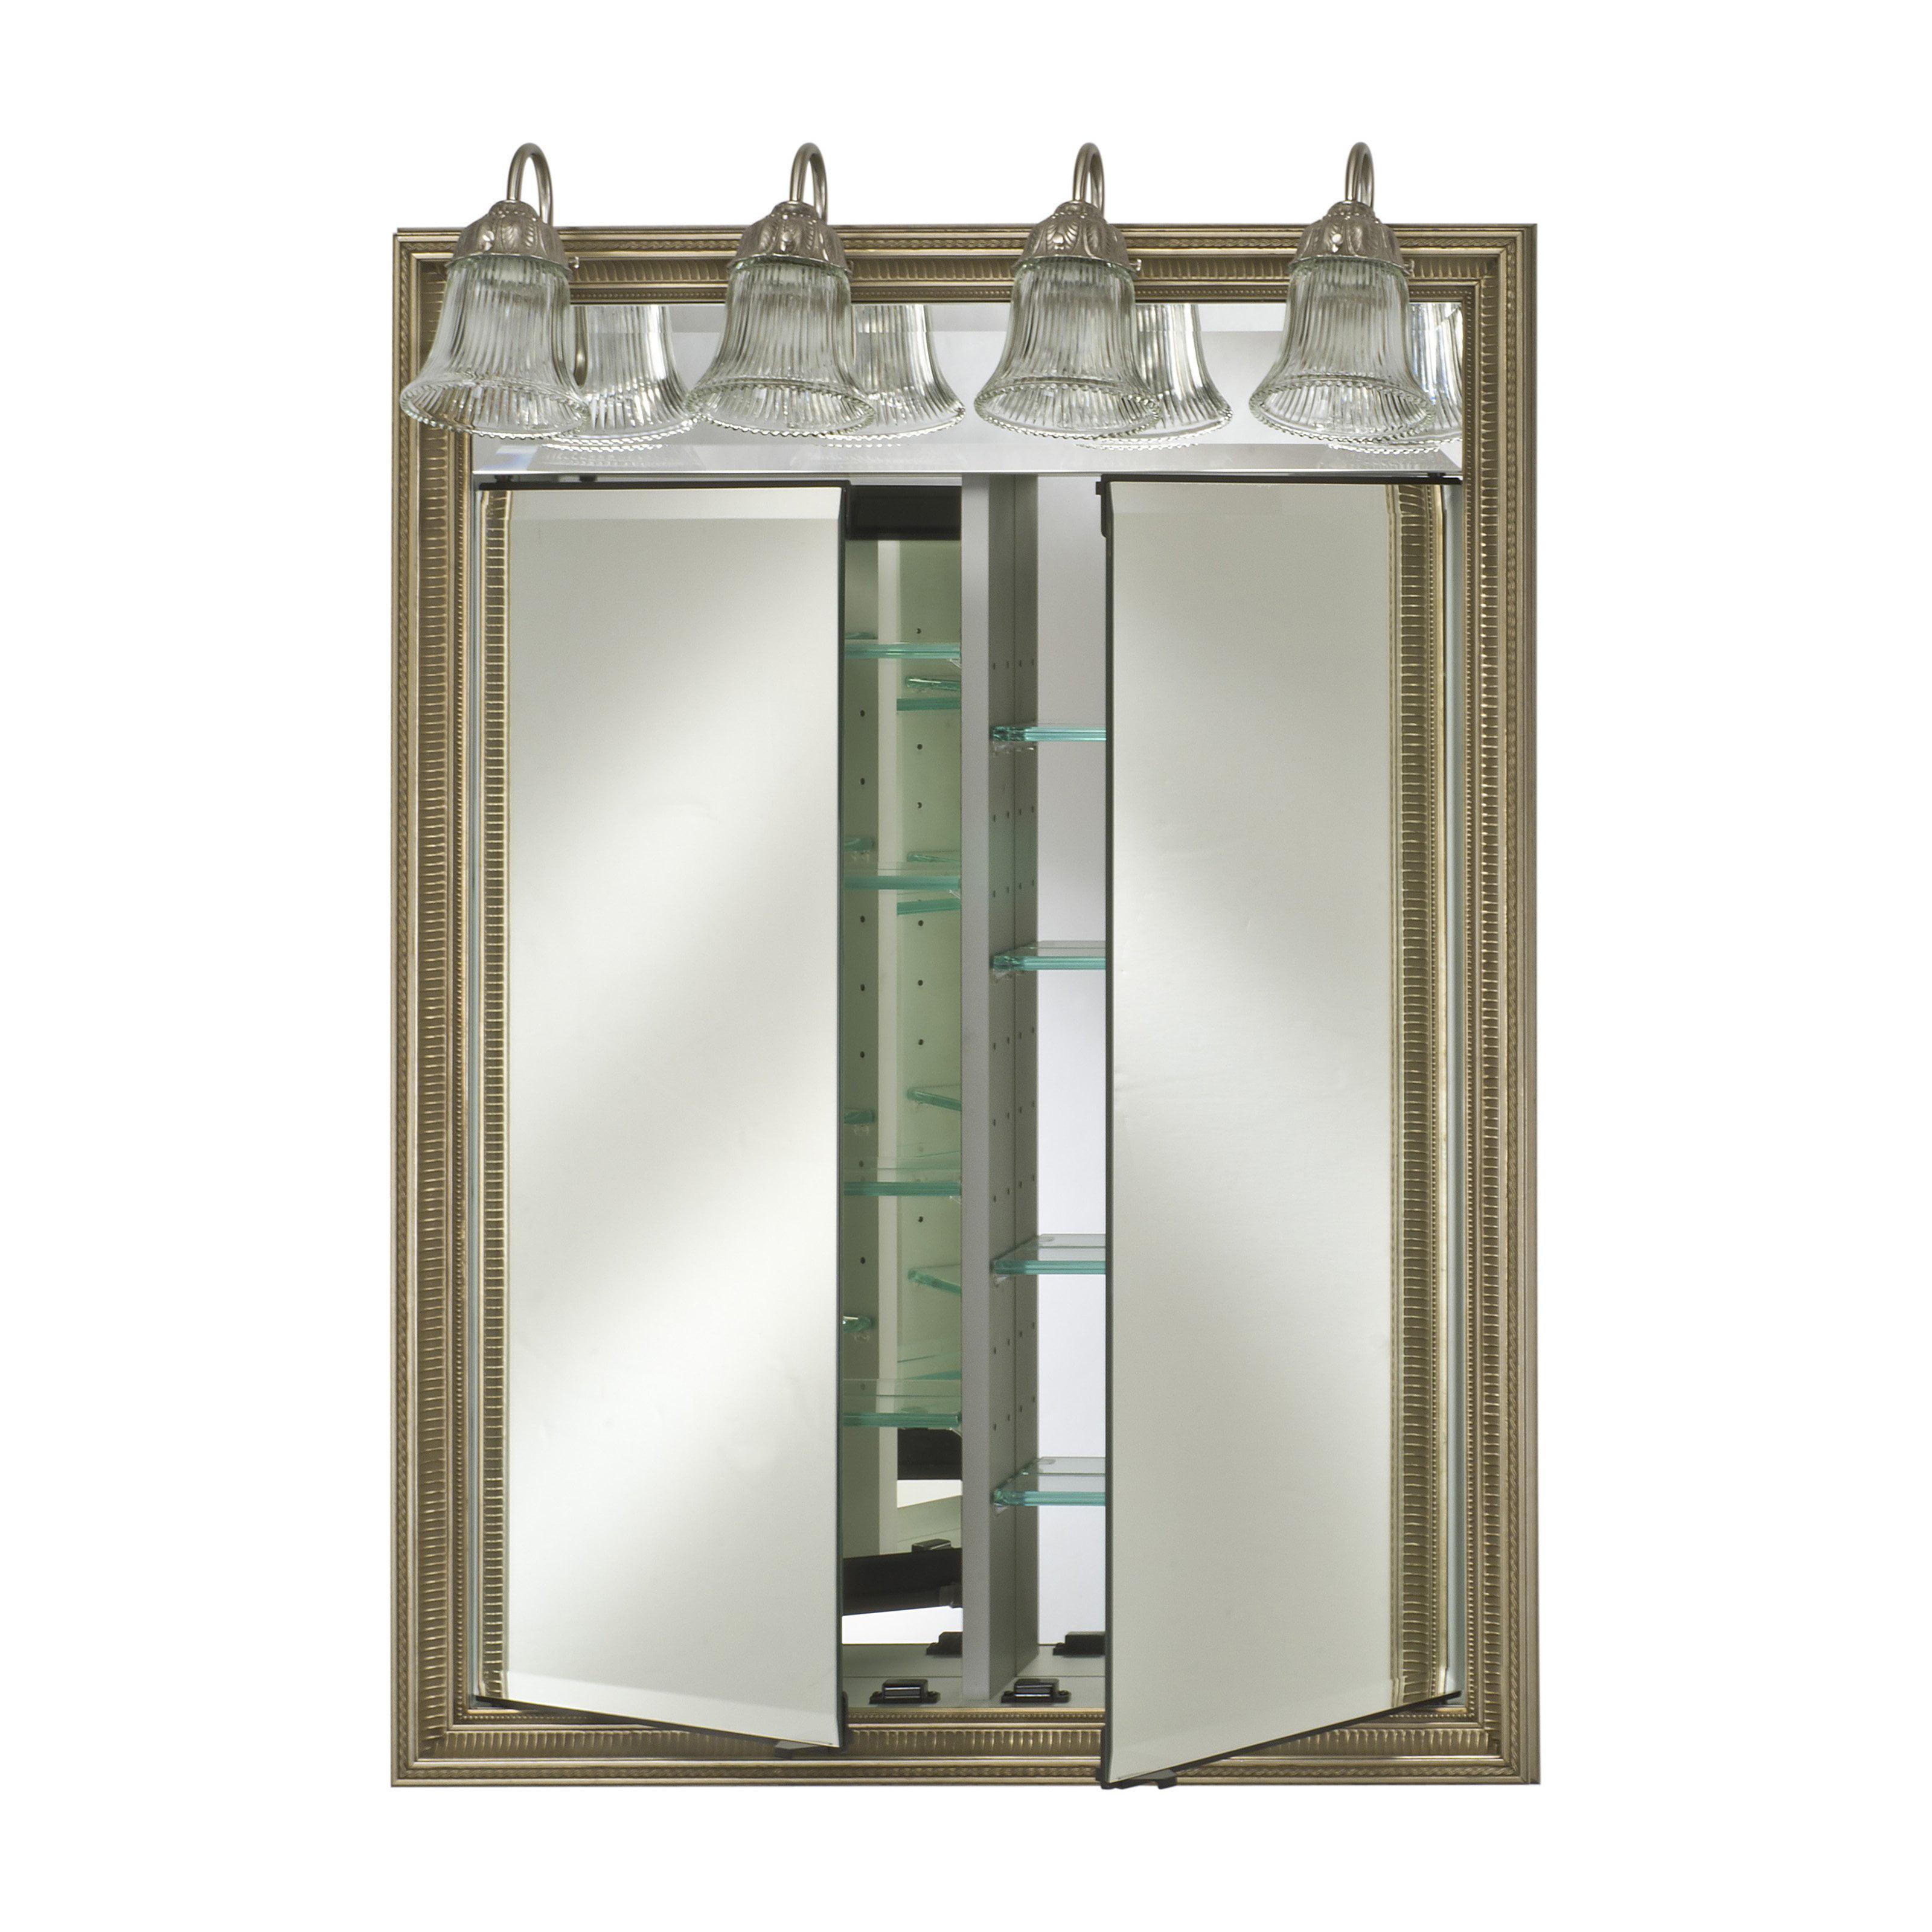 Afina Signature Contemporary Lighted Double Door 21W x 40H in. Recessed Medicine Cabinet